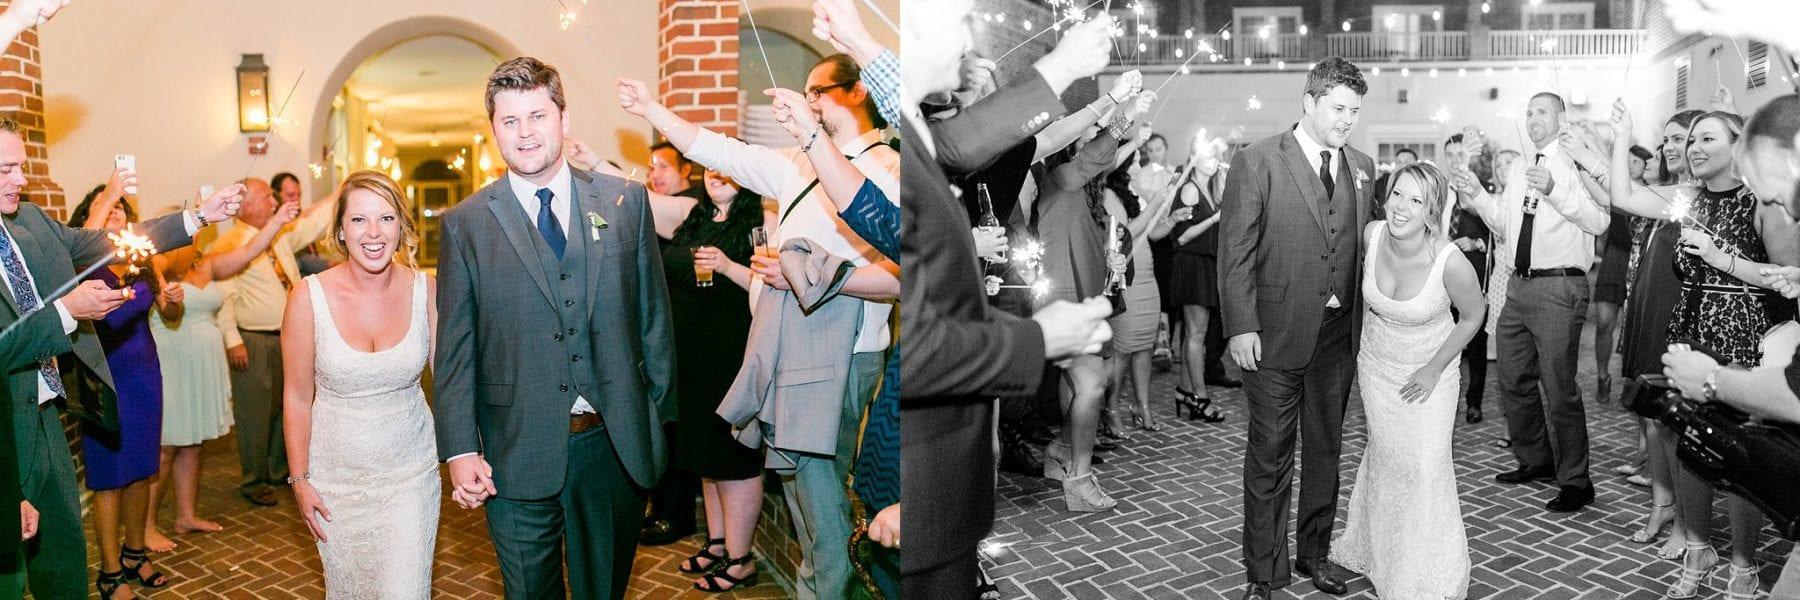 Hotel Monaco Wedding Photos Virginia Wedding Photographer Megan Kelsey Photography Kevin & Morgan-865.JPG